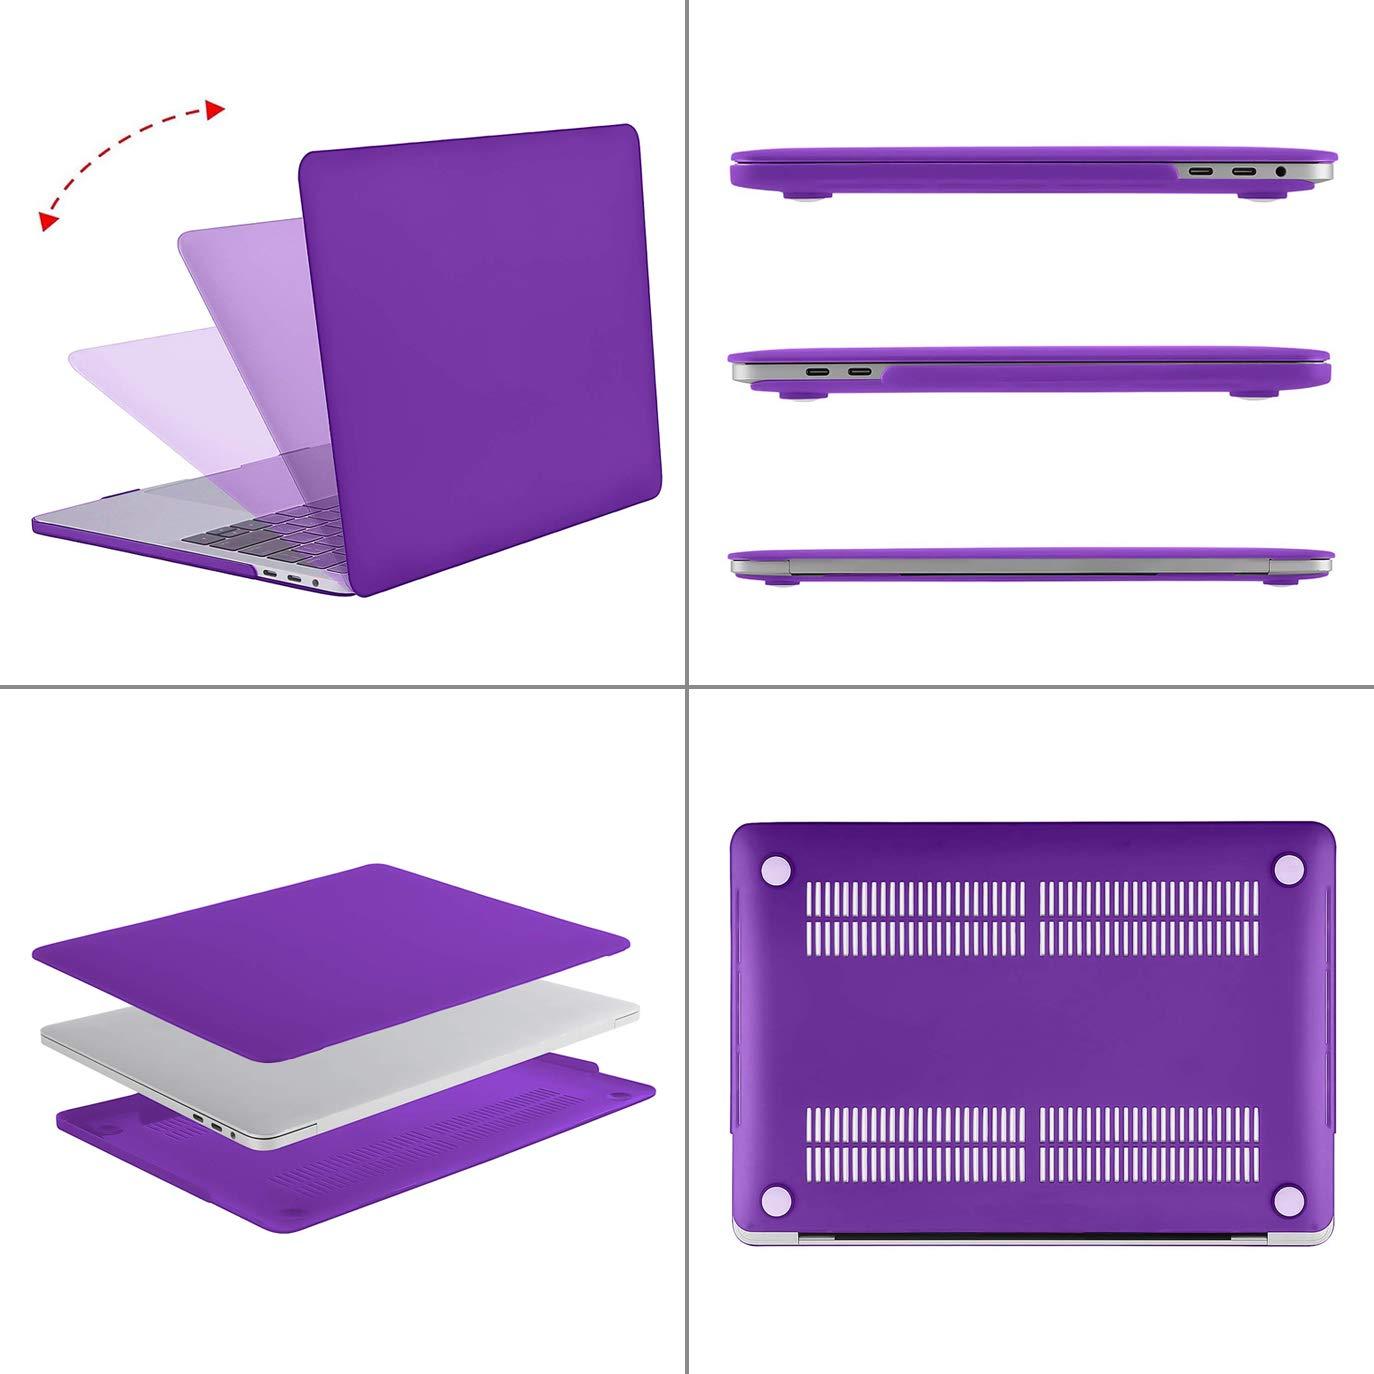 MOSISO Funda Dura Compatible con 2019 2018 2017 2016 MacBook Pro 13 con//sin Touch Bar A2159 A1989 A1706 A1708 USB-C Ultra Delgado Carcasa R/ígida Protector de Pl/ástico Cubierta Capulet Olive